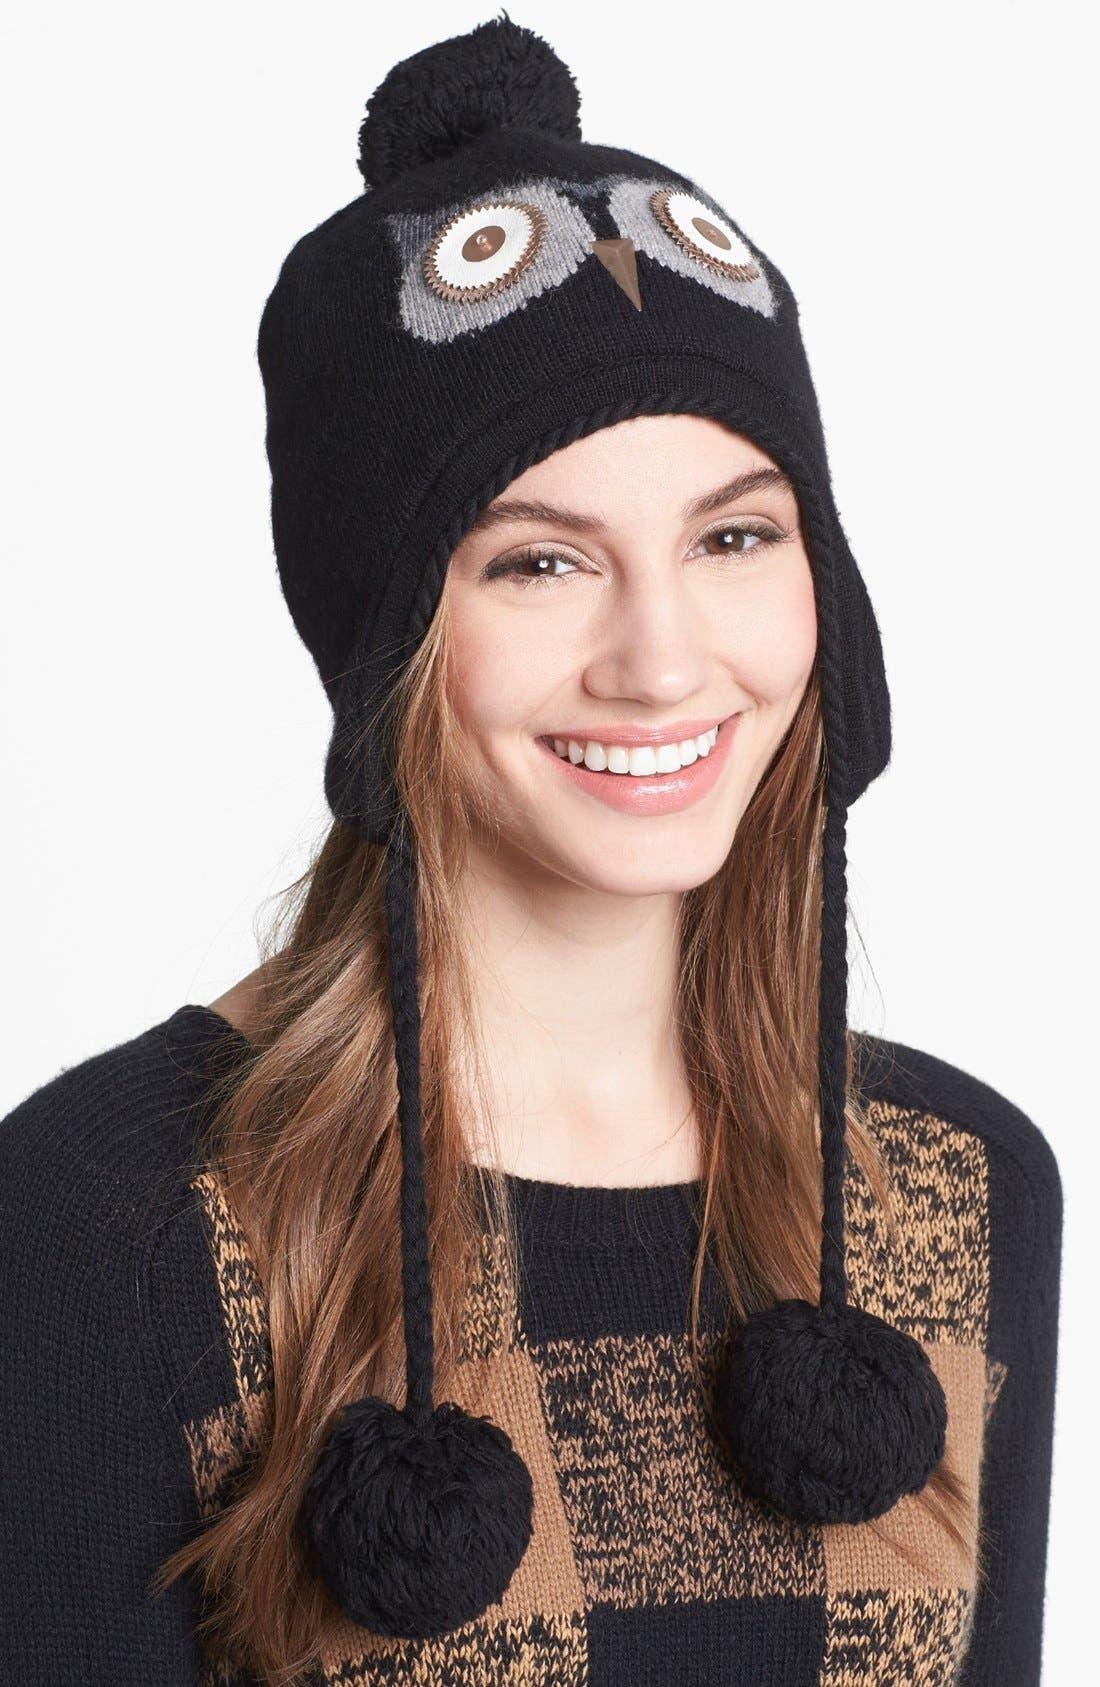 Alternate Image 1 Selected - kate spade new york 'night owl' hat